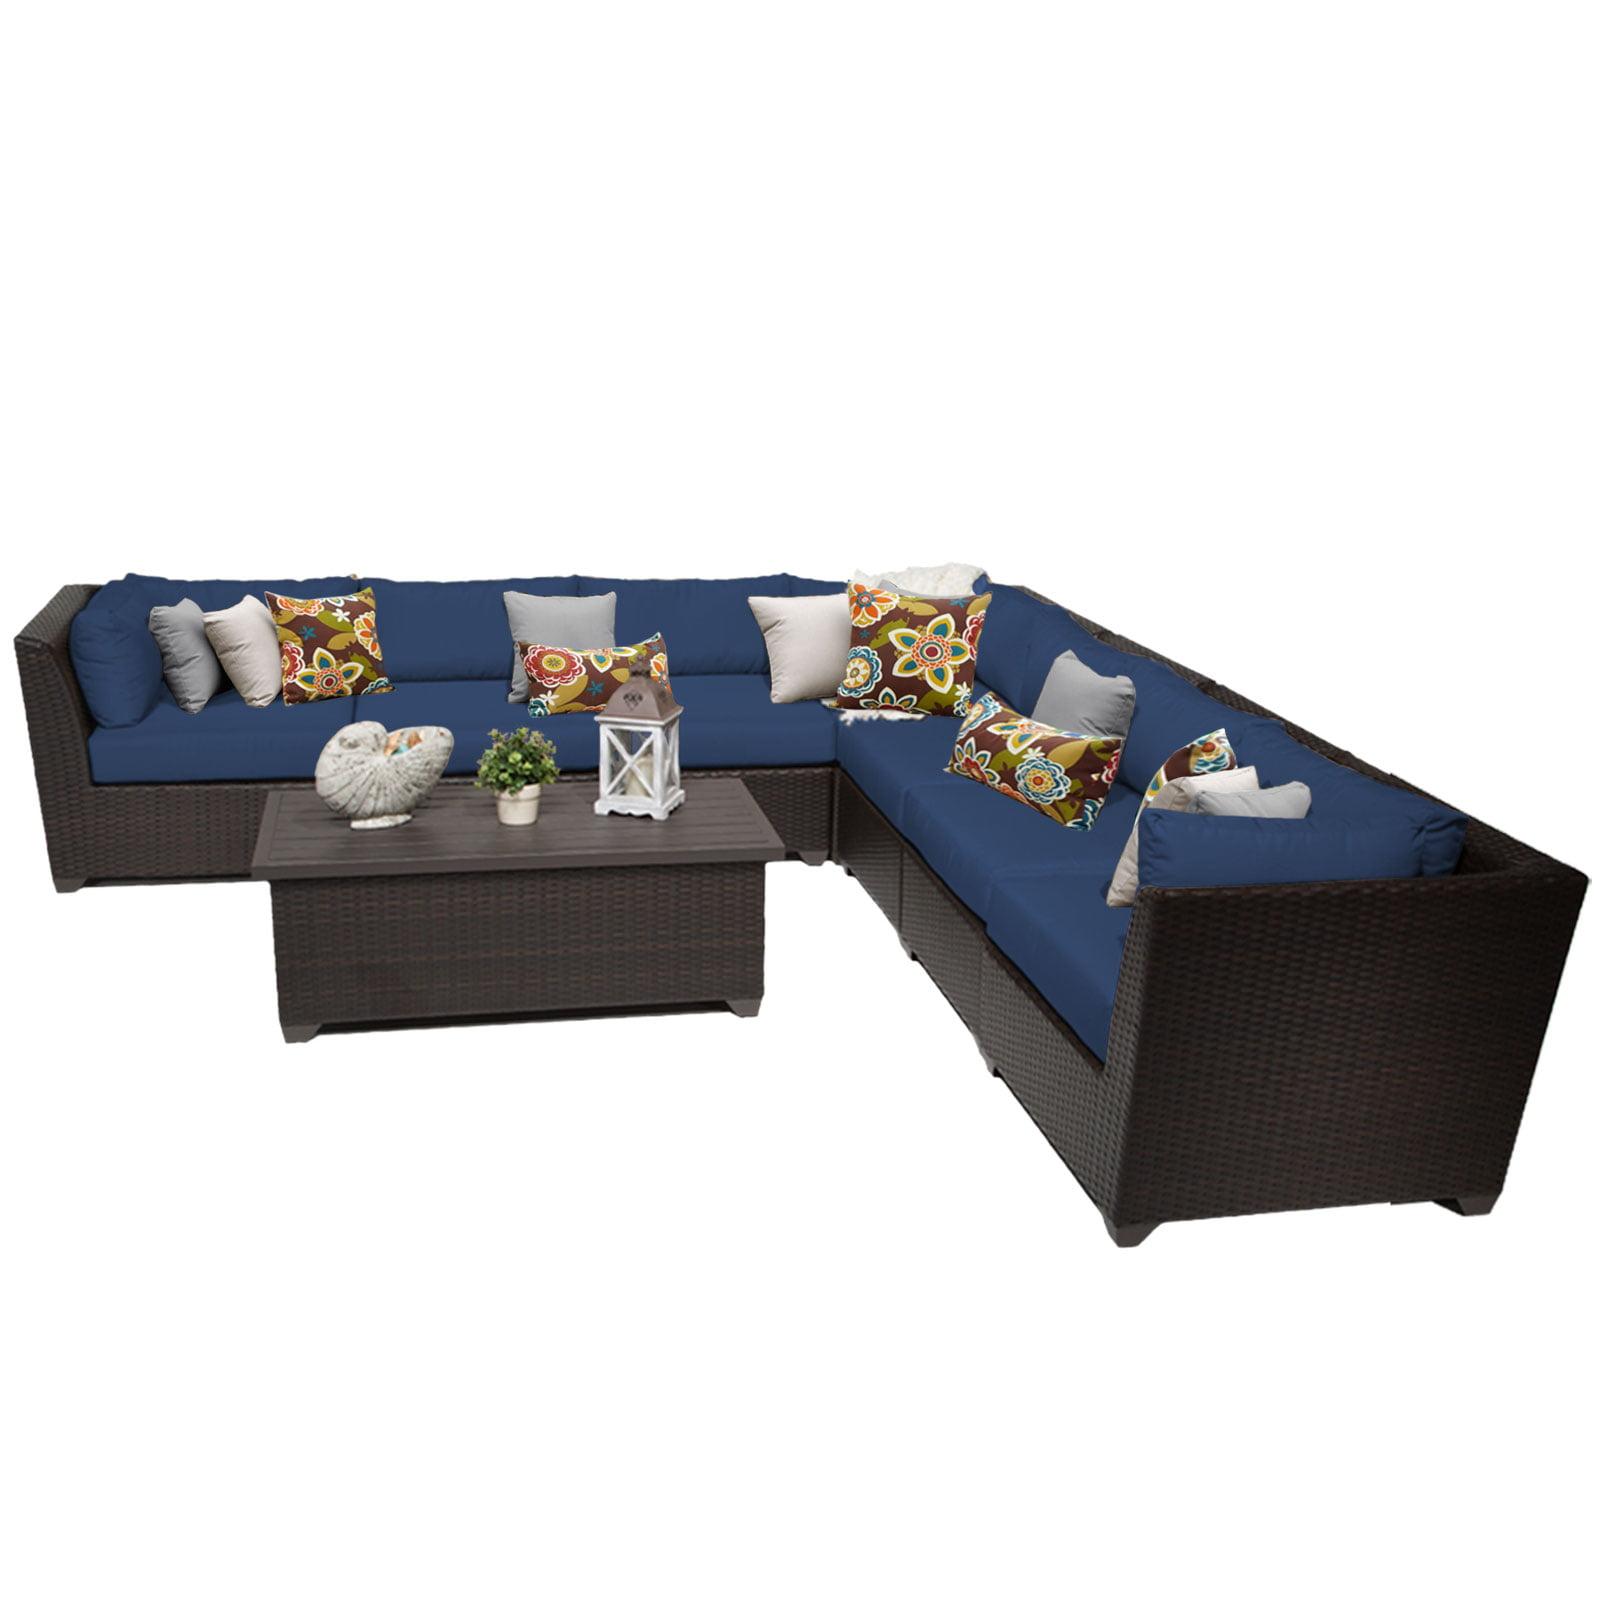 Bermuda 8 Piece Outdoor Wicker Patio Furniture Set 08a by TK Classics